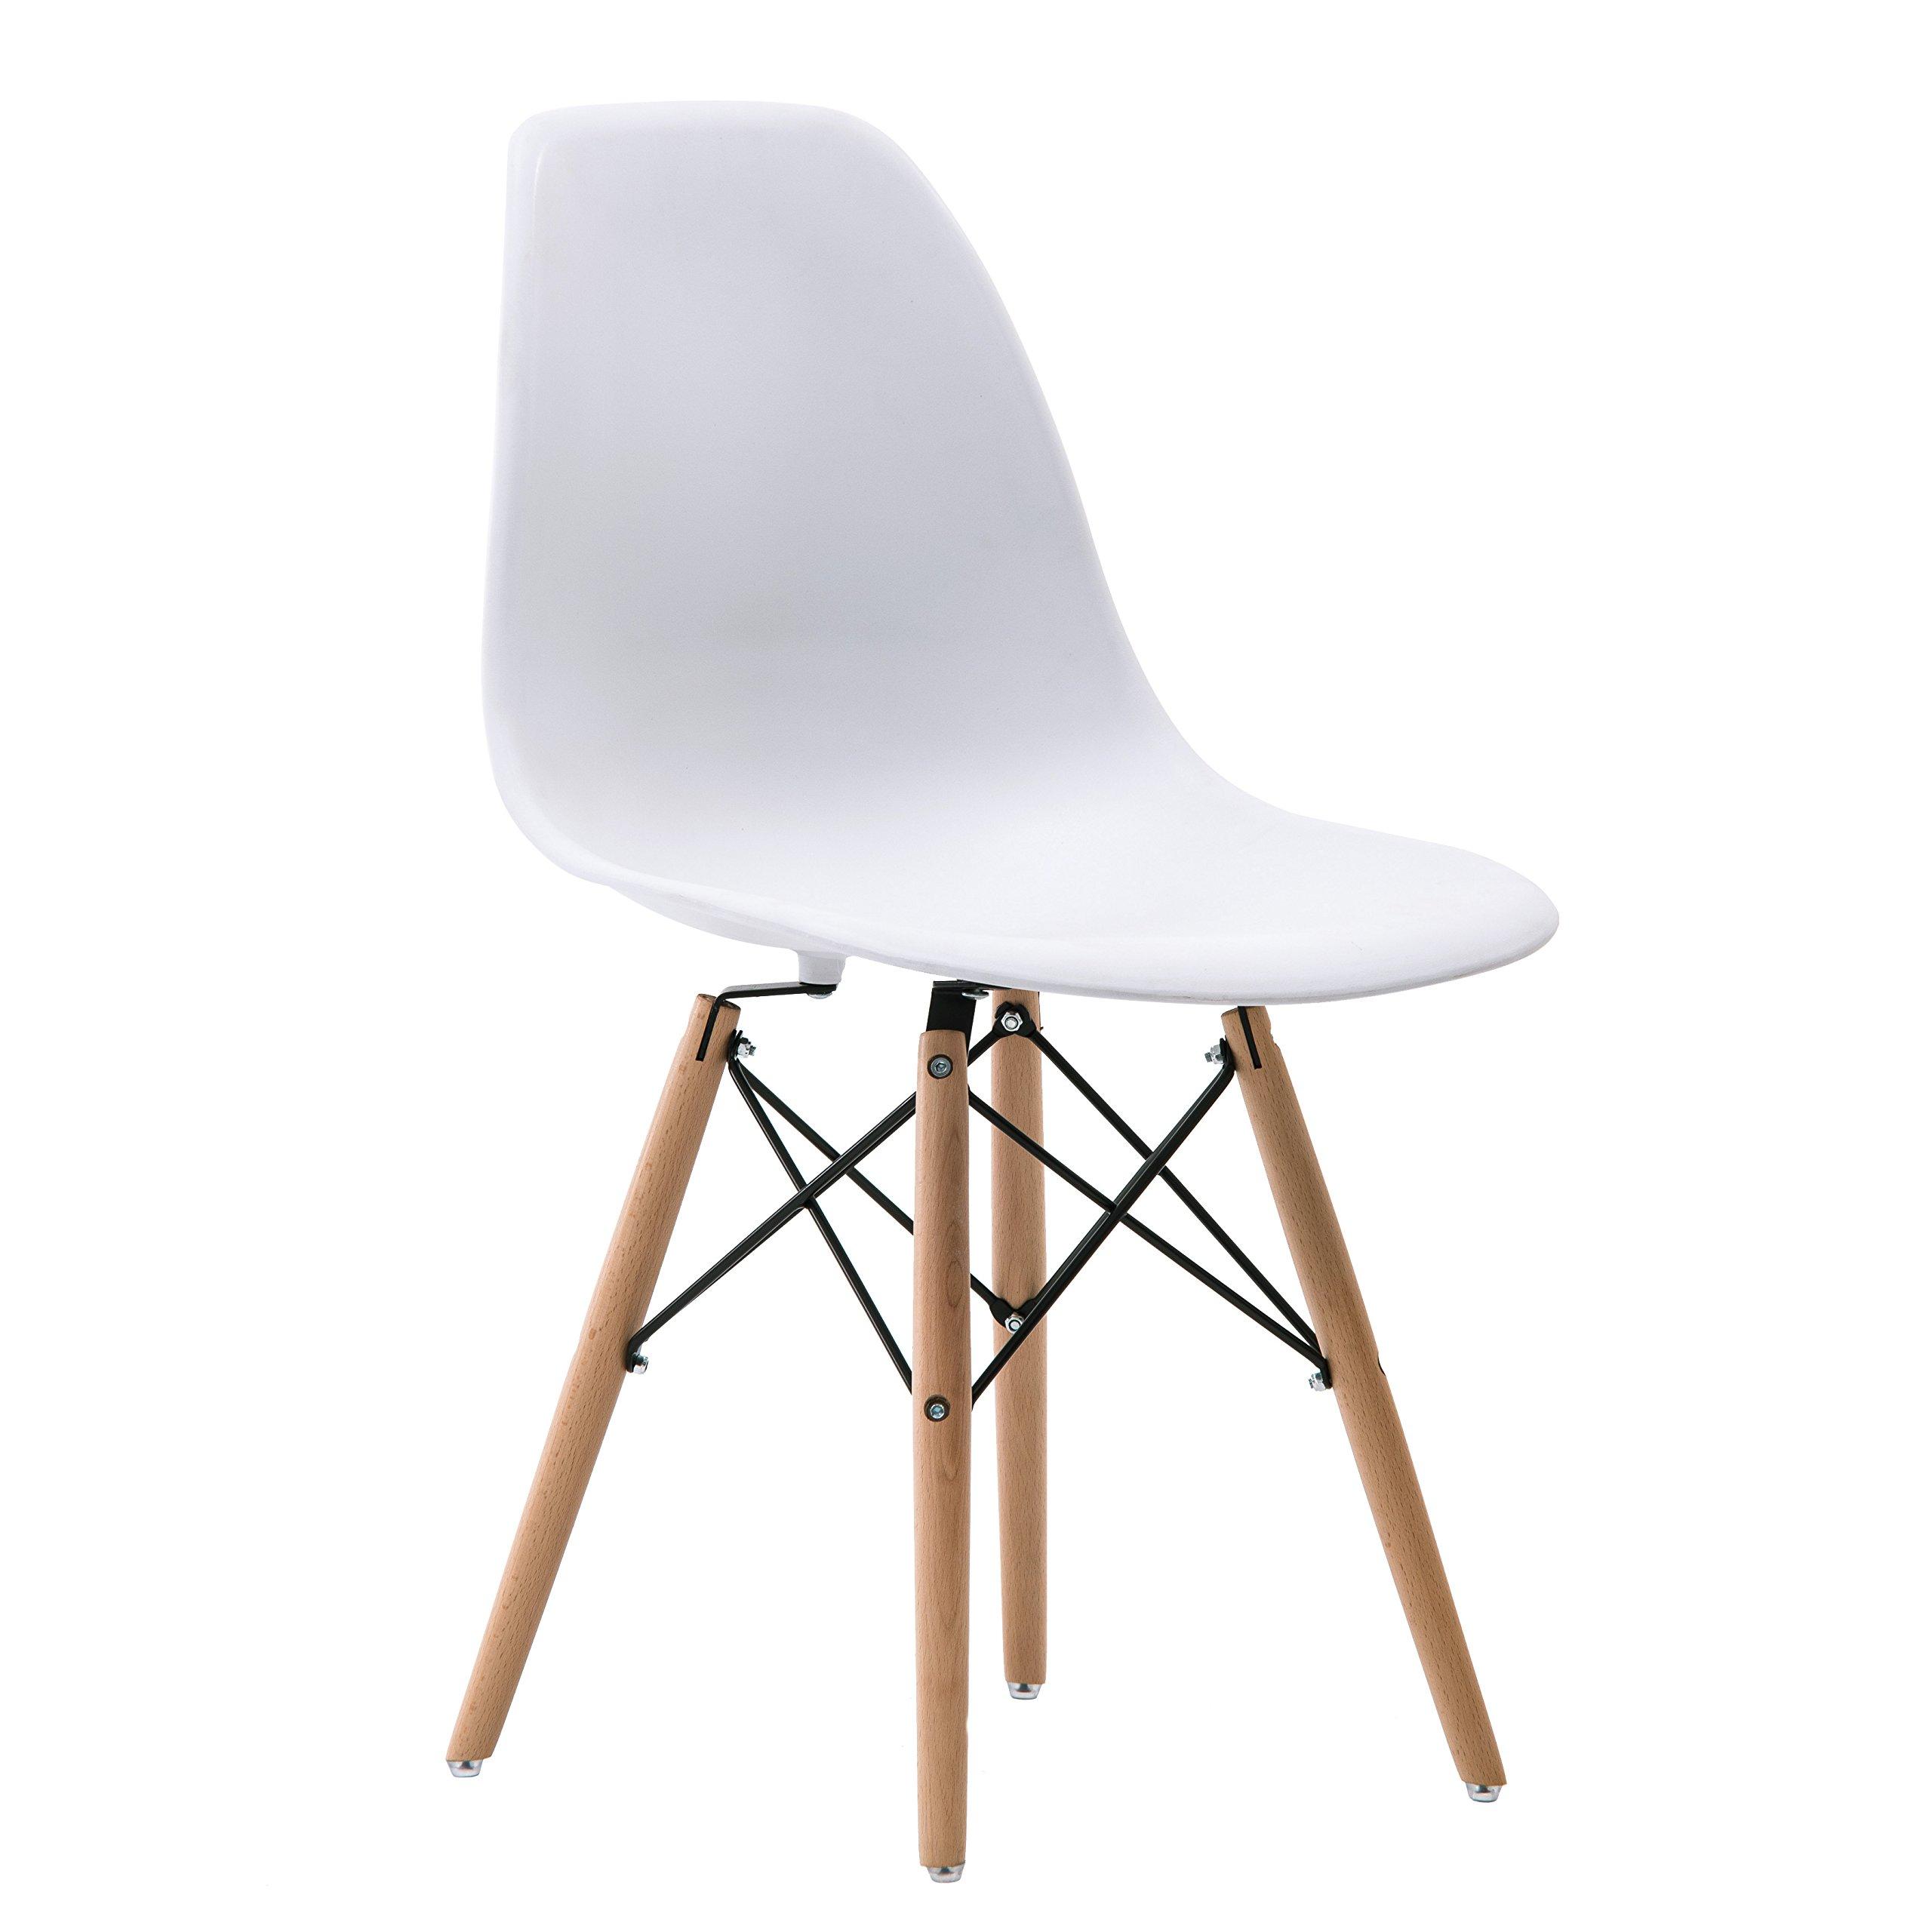 Porthos Home April Mid-Century Eames Chair, White